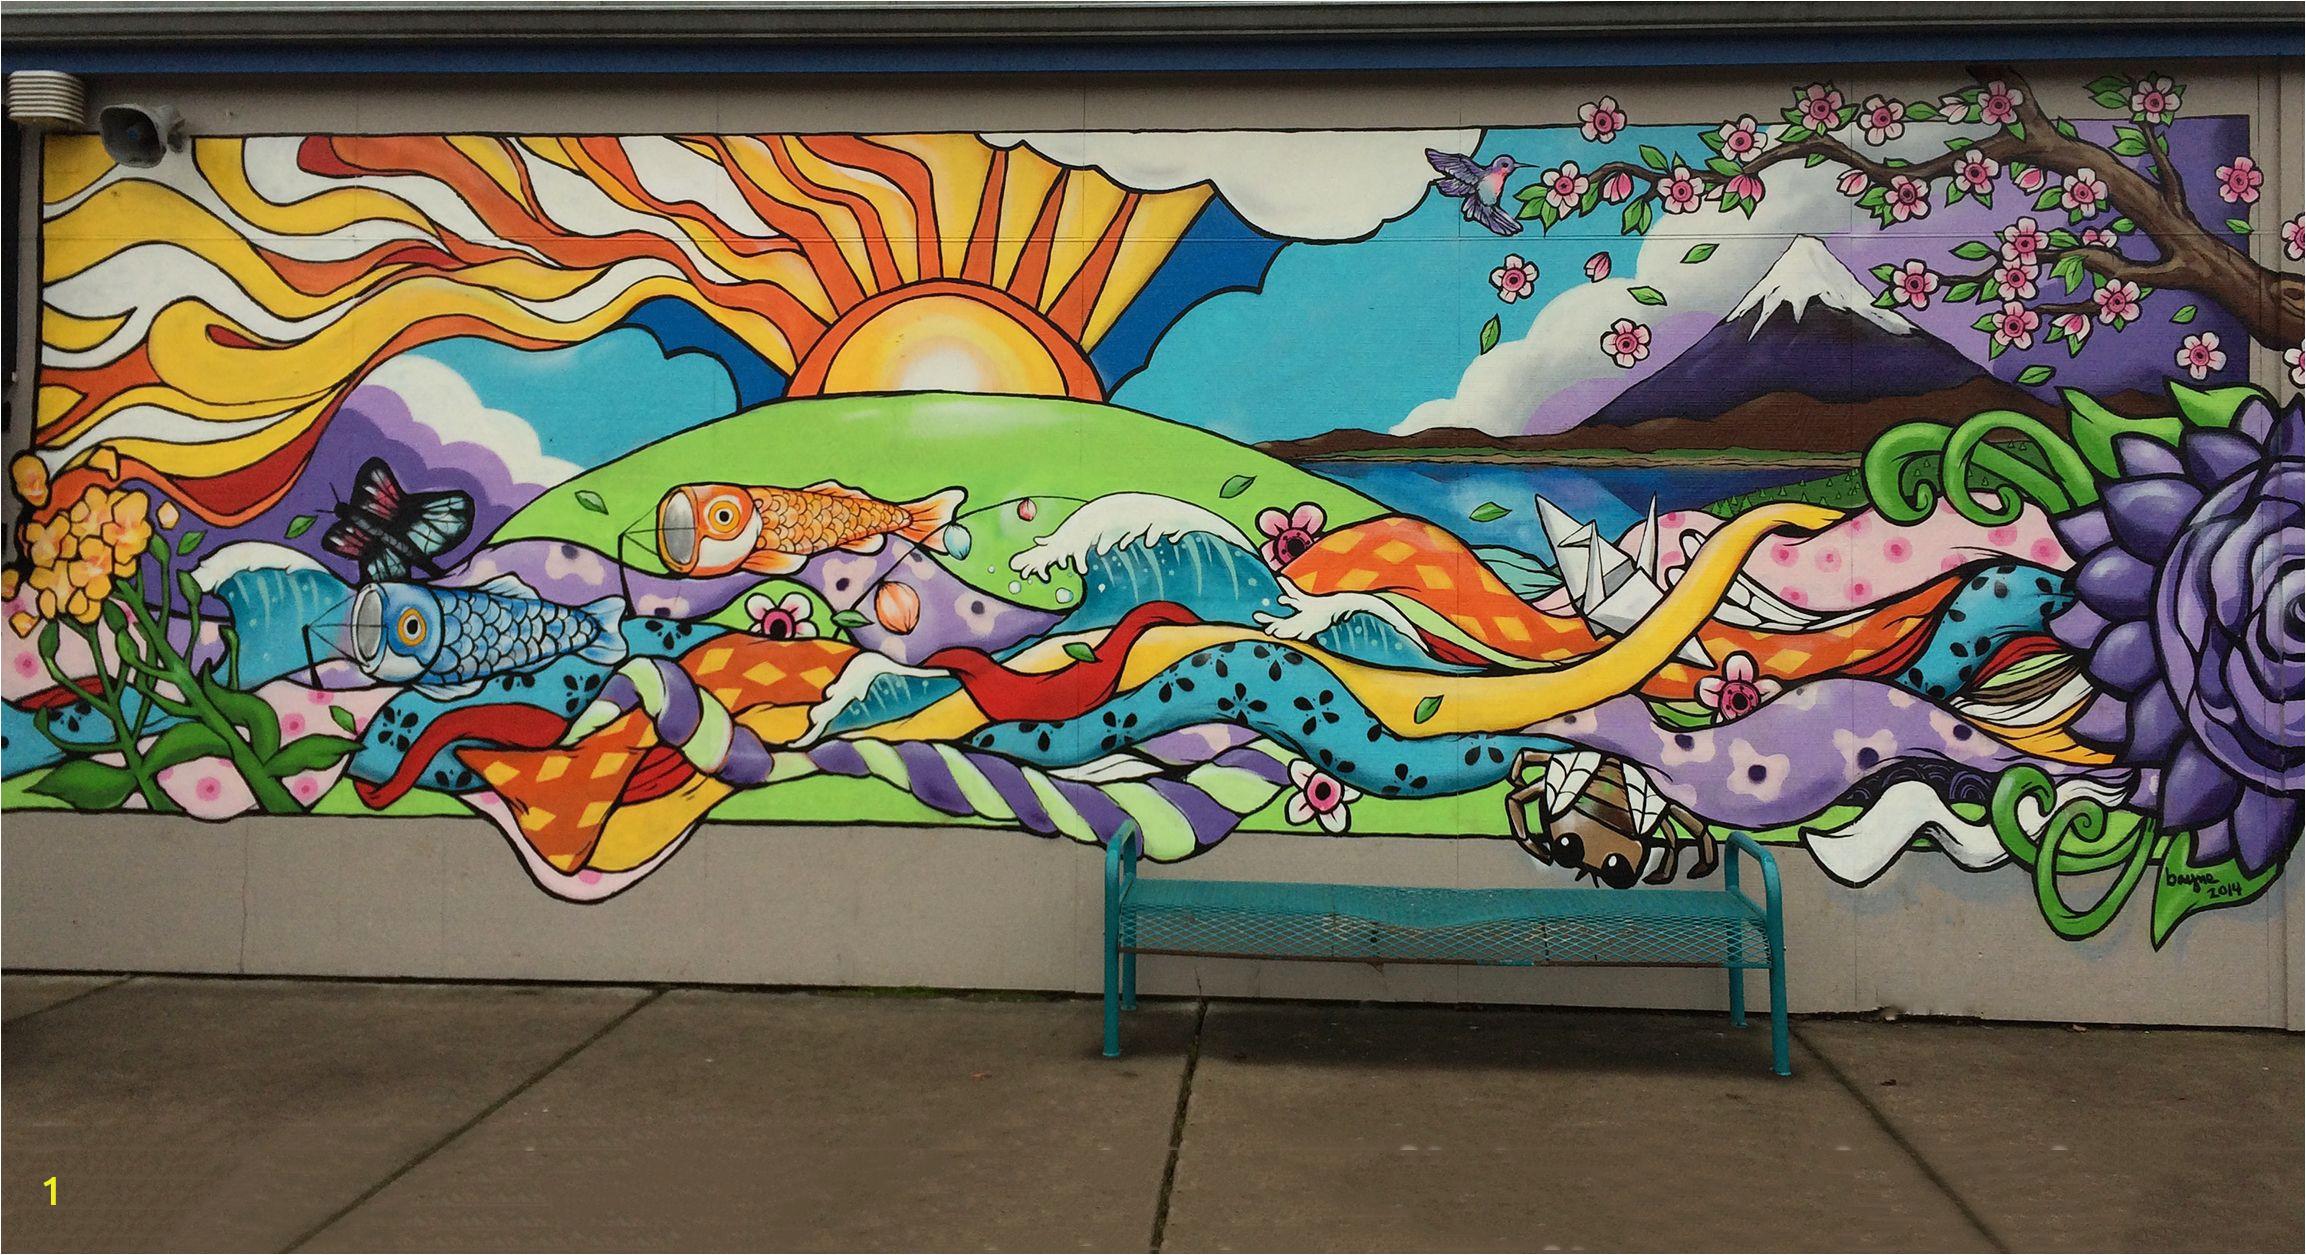 Wall Mural Ideas School Elementary School Mural Google Search